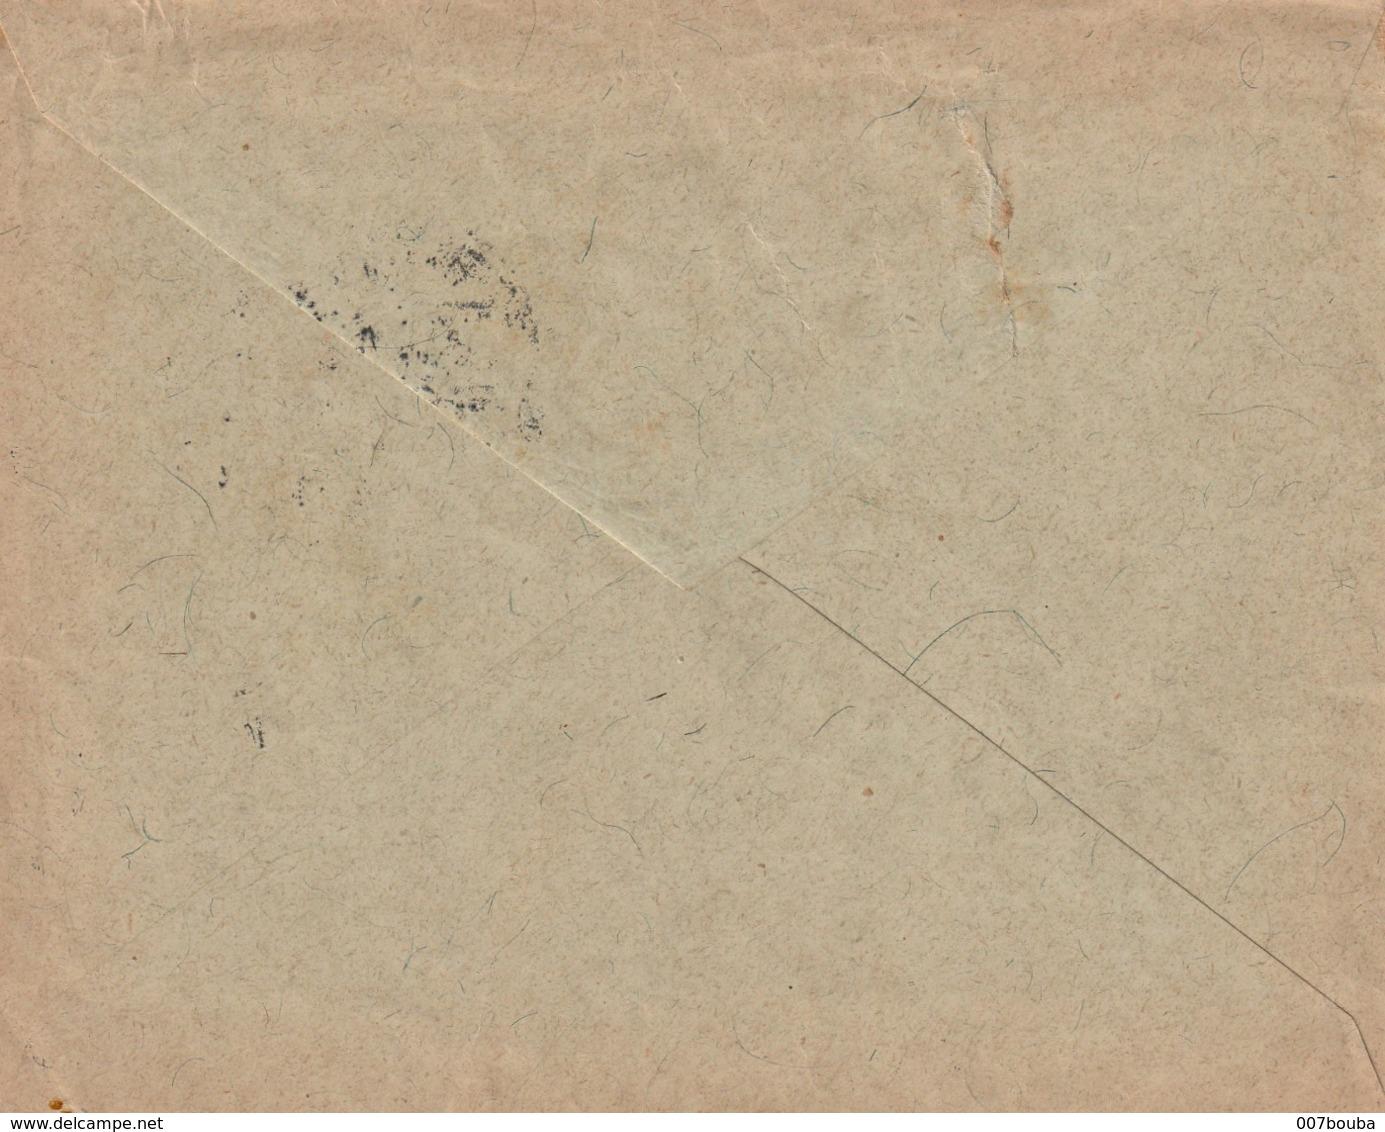 GENTBRUGGE OC31 Sur Lettre à Entête I. De Jong /  Postüberwachungsstelle 33/ , 31.6.17 Vers BRUGGE - Guerre 14-18